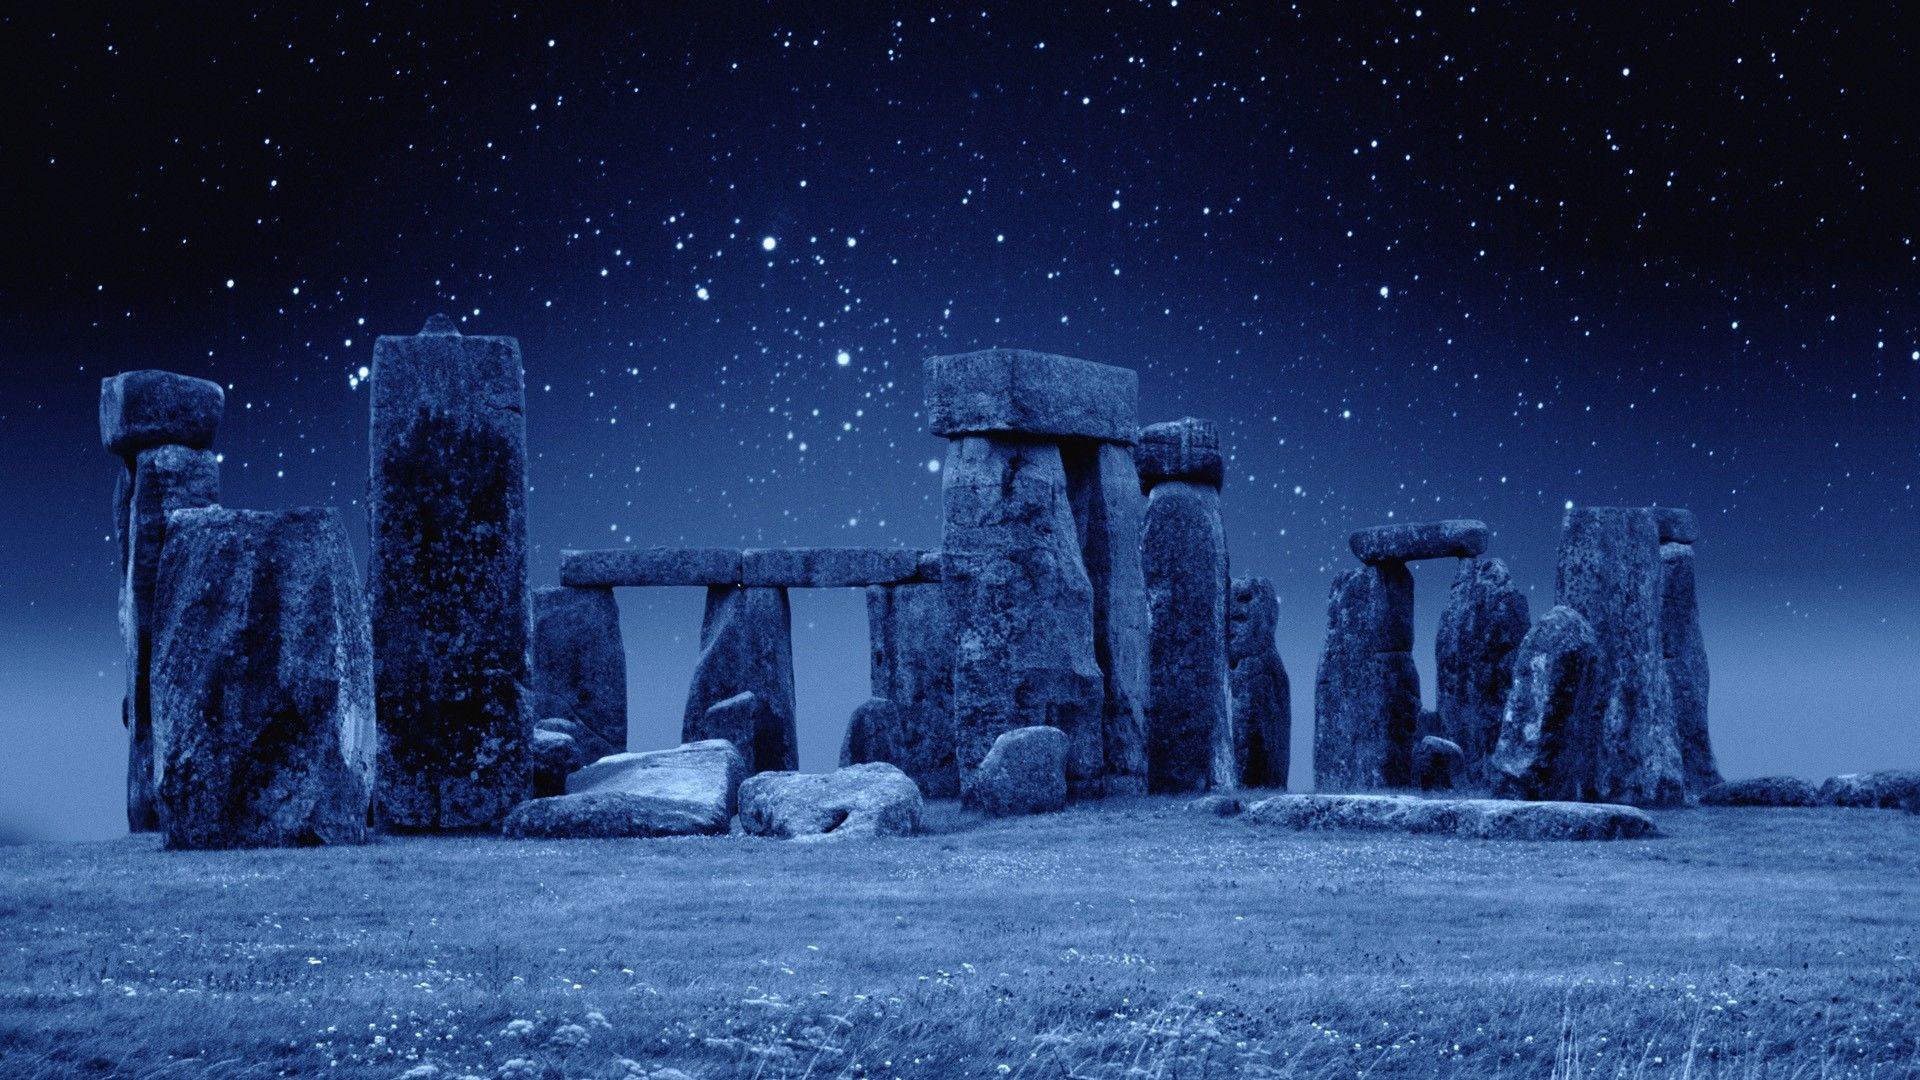 Stonehenge England Stars HD Wallpaper FullHDWpp   Full HD 1920x1080